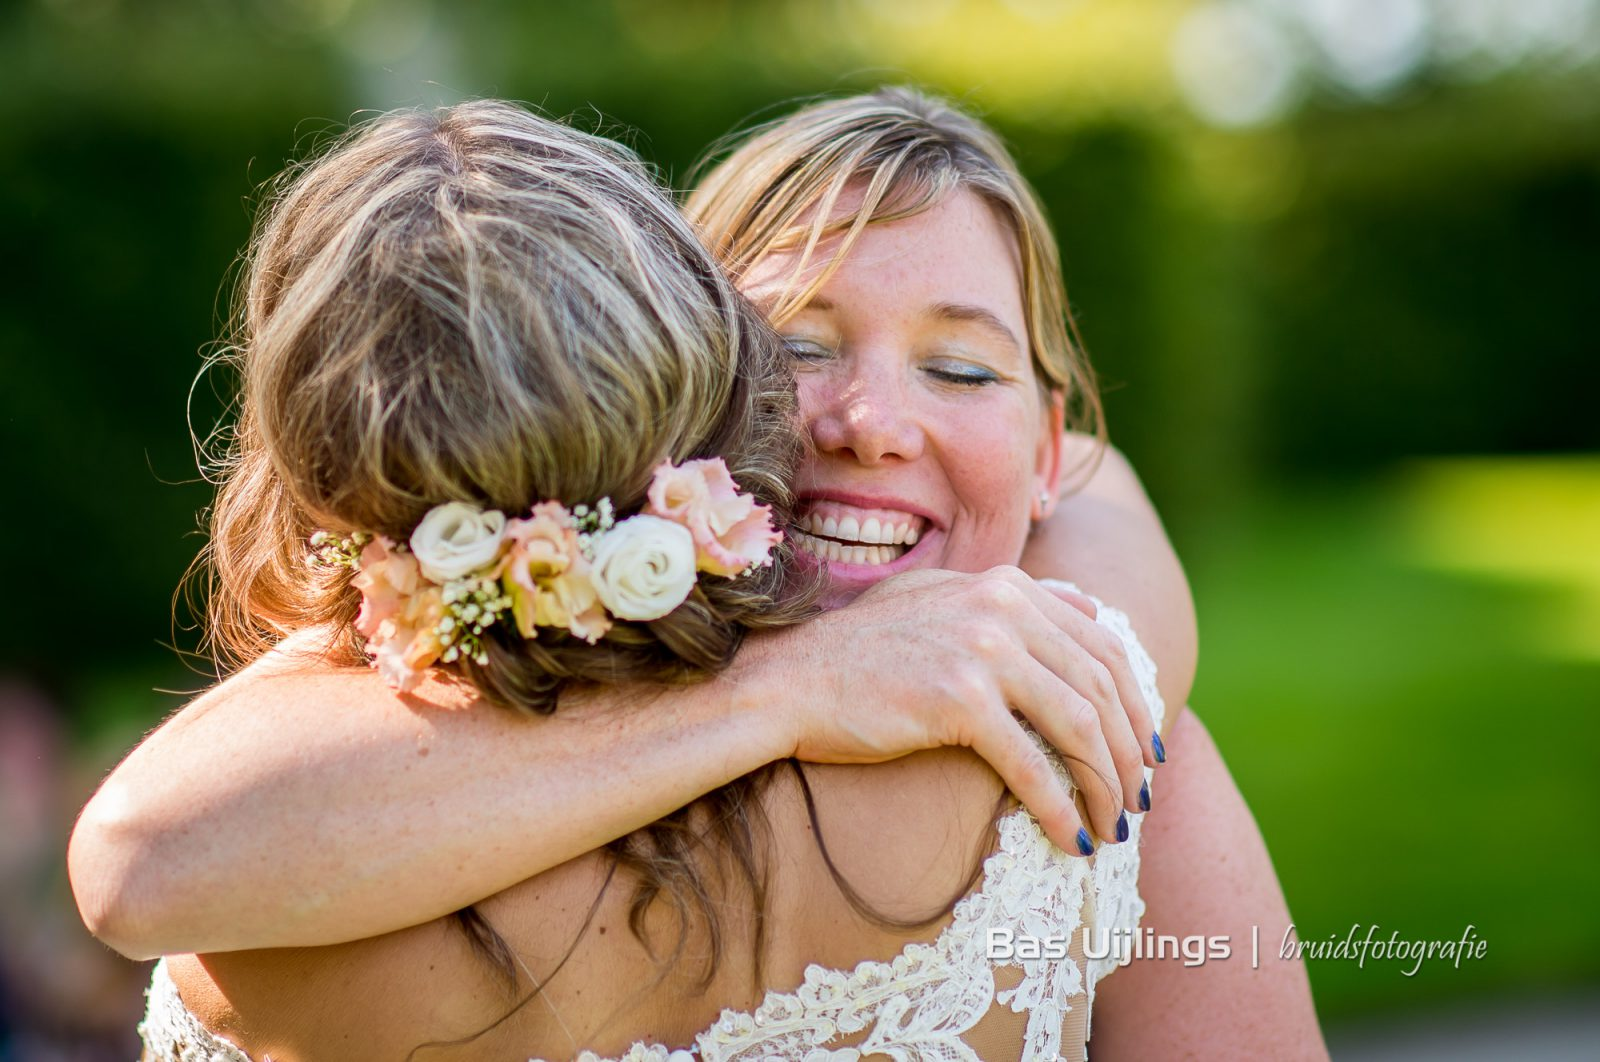 Bruid felicitatie